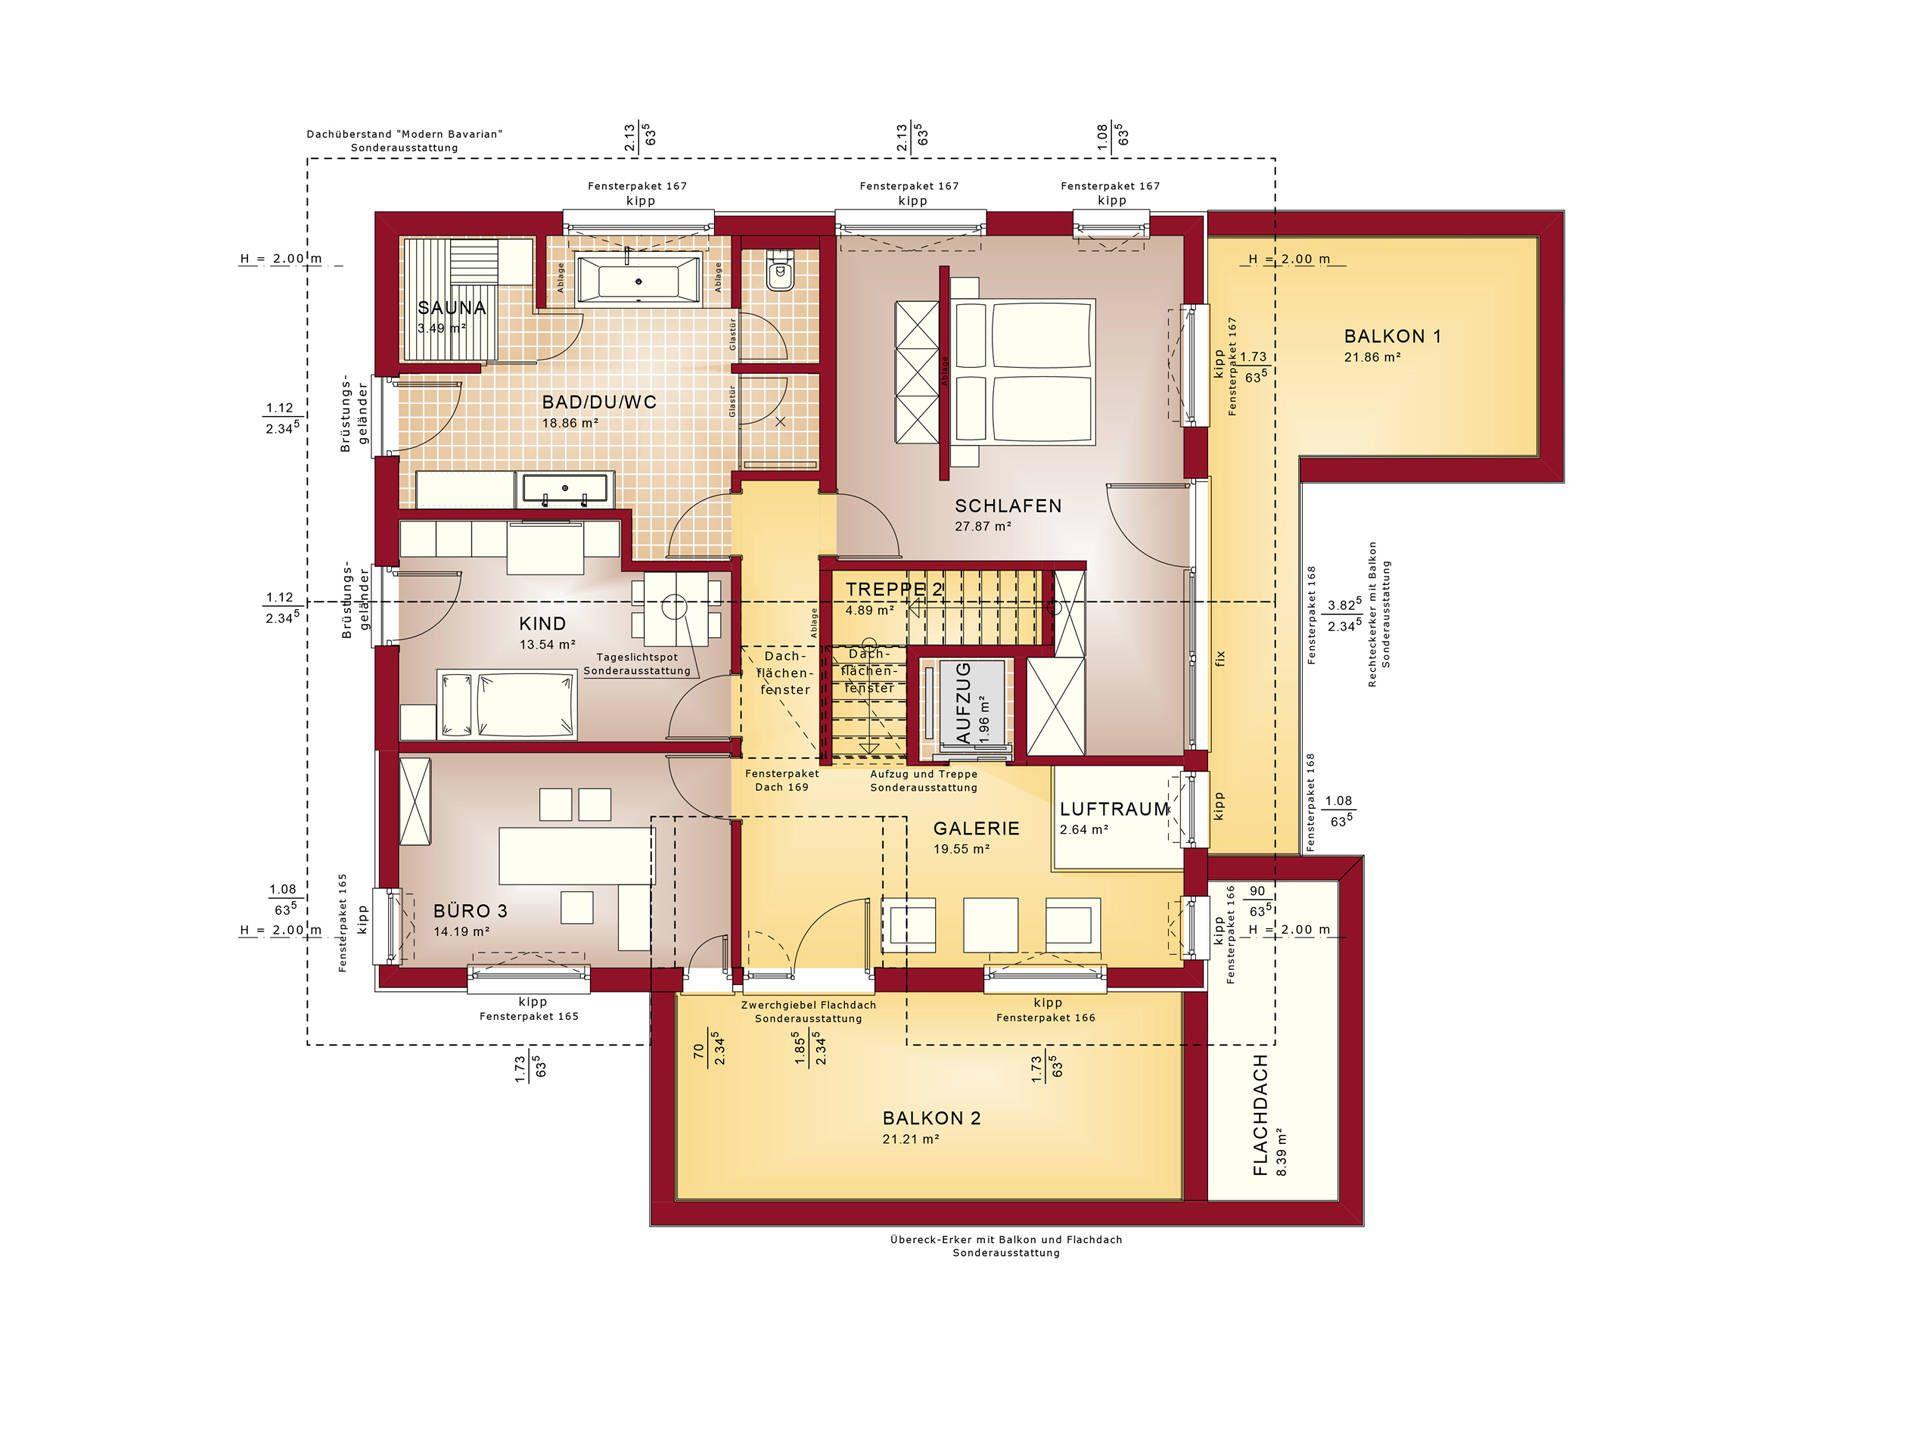 grundriss dg evolution mannheim von bien zenker floor plans pinterest musterhaus. Black Bedroom Furniture Sets. Home Design Ideas